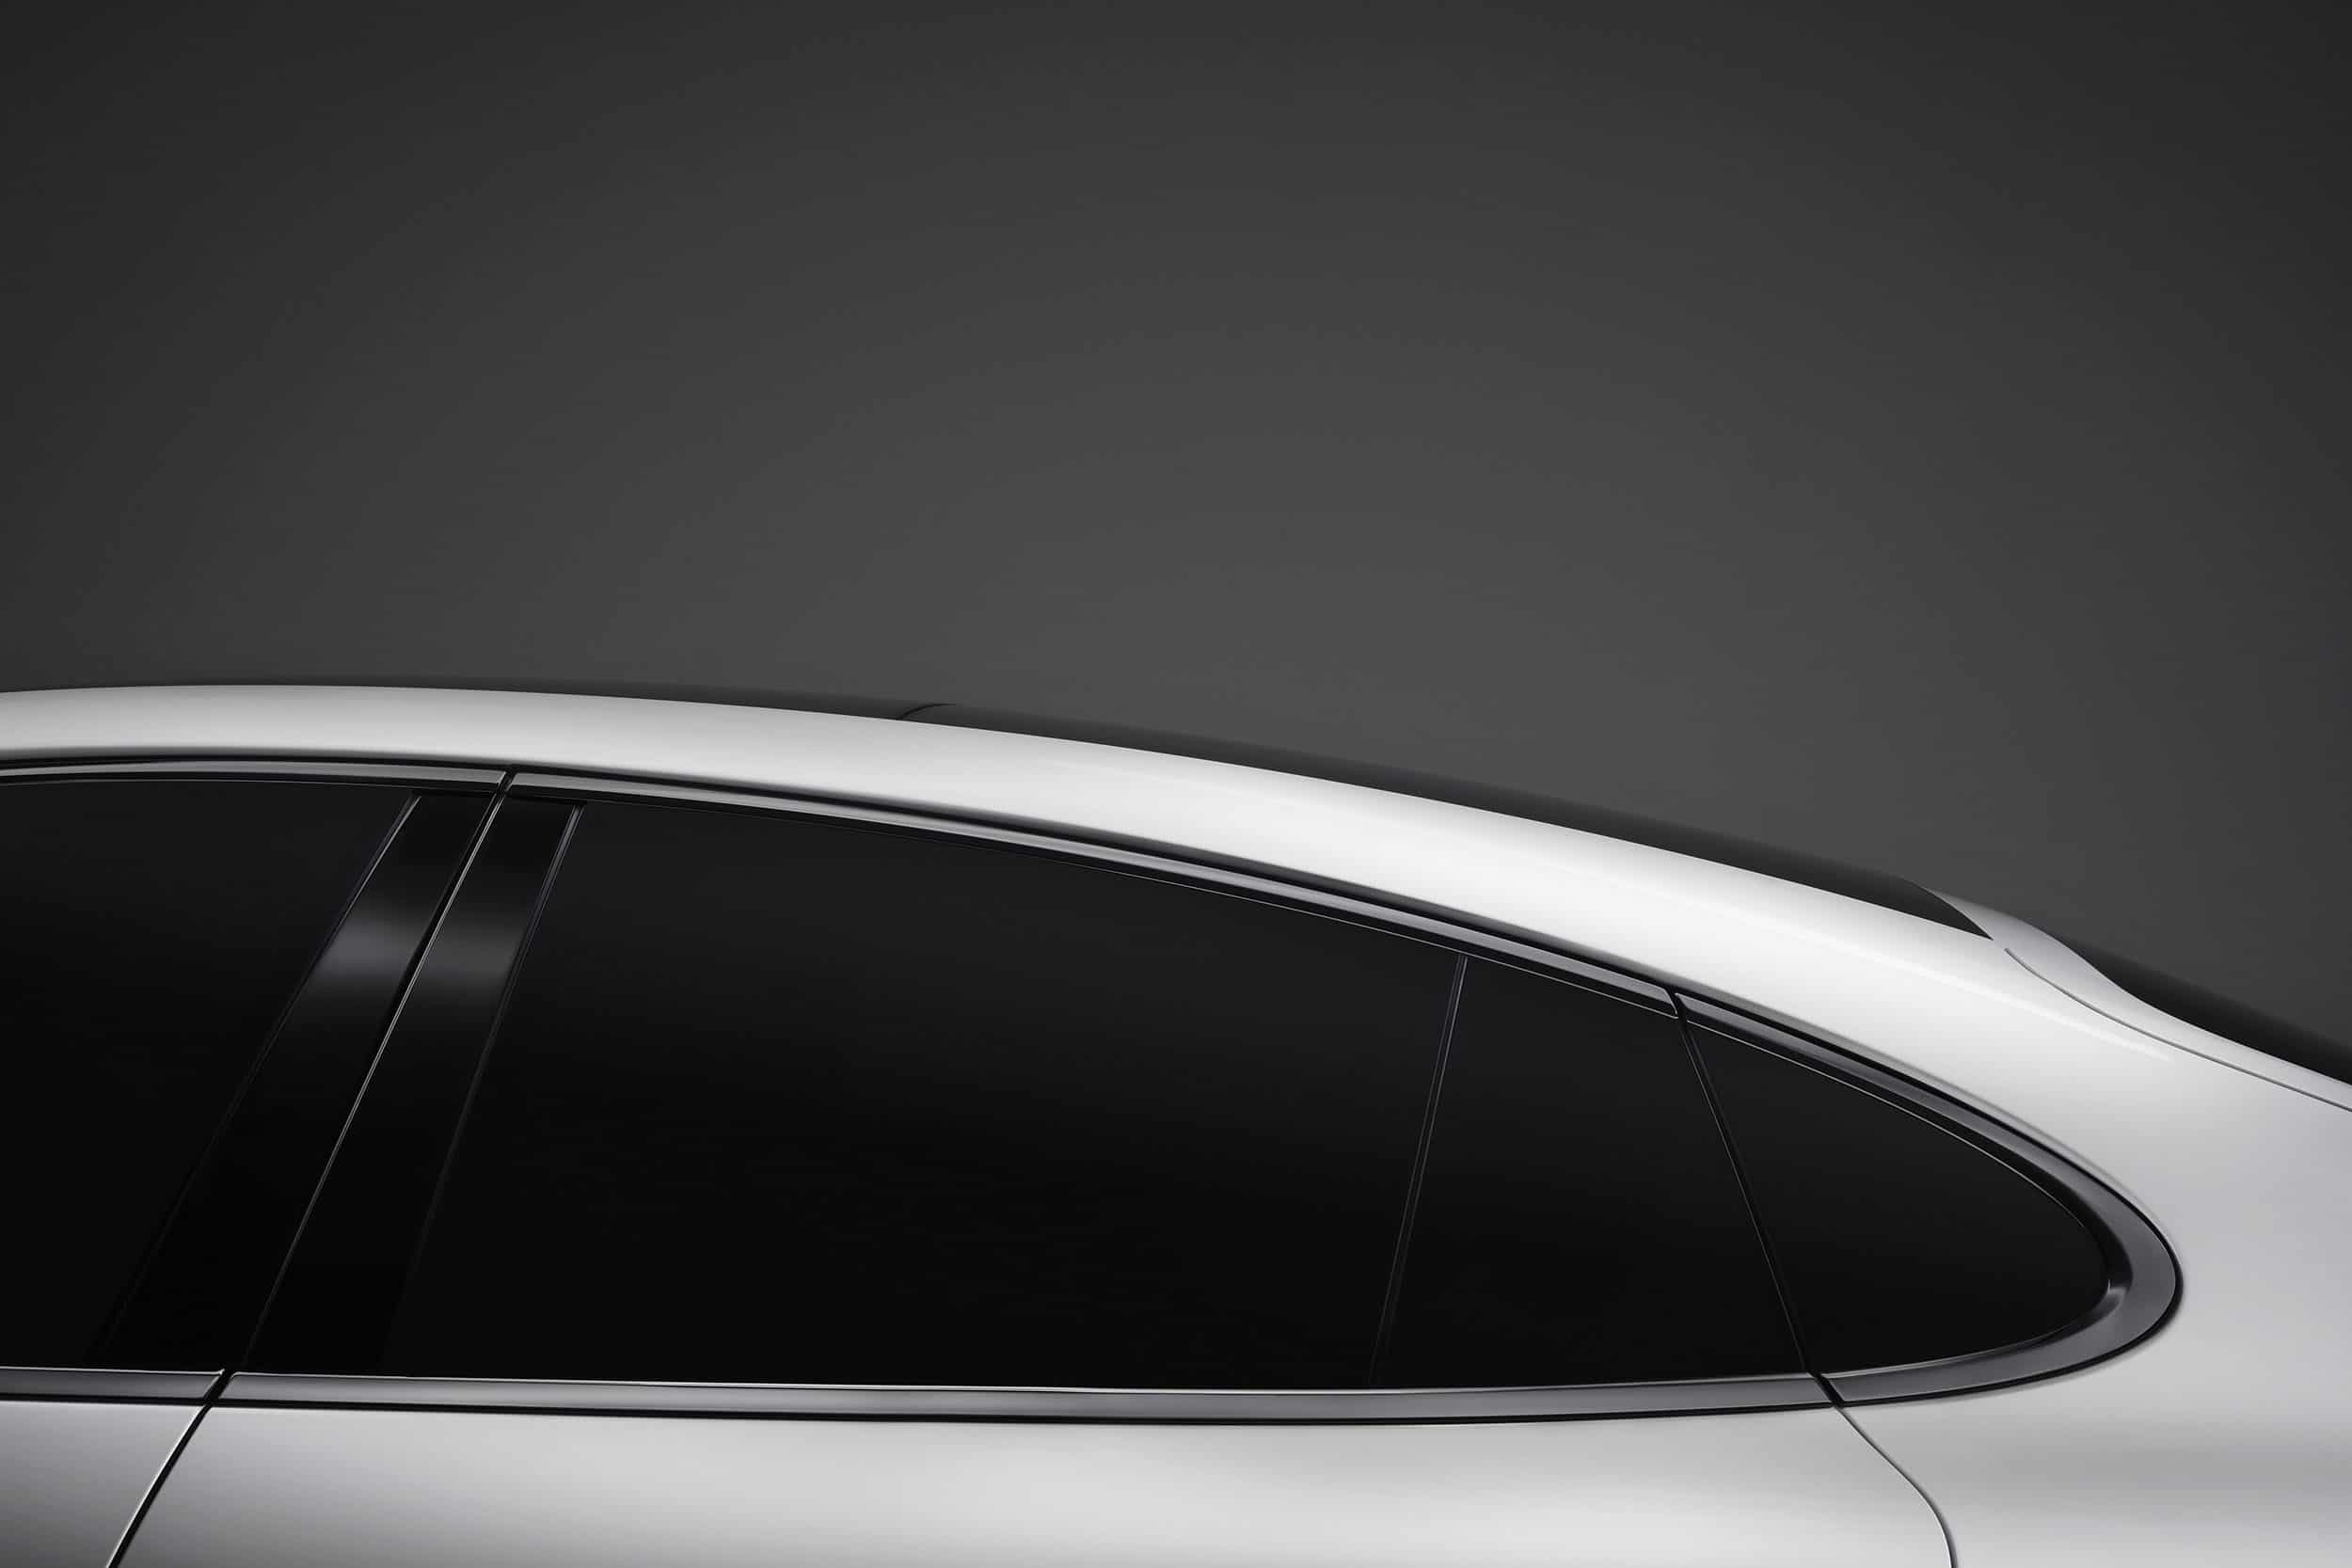 studio-ignatov-wkw-automotive-imagekampagne-bw-12